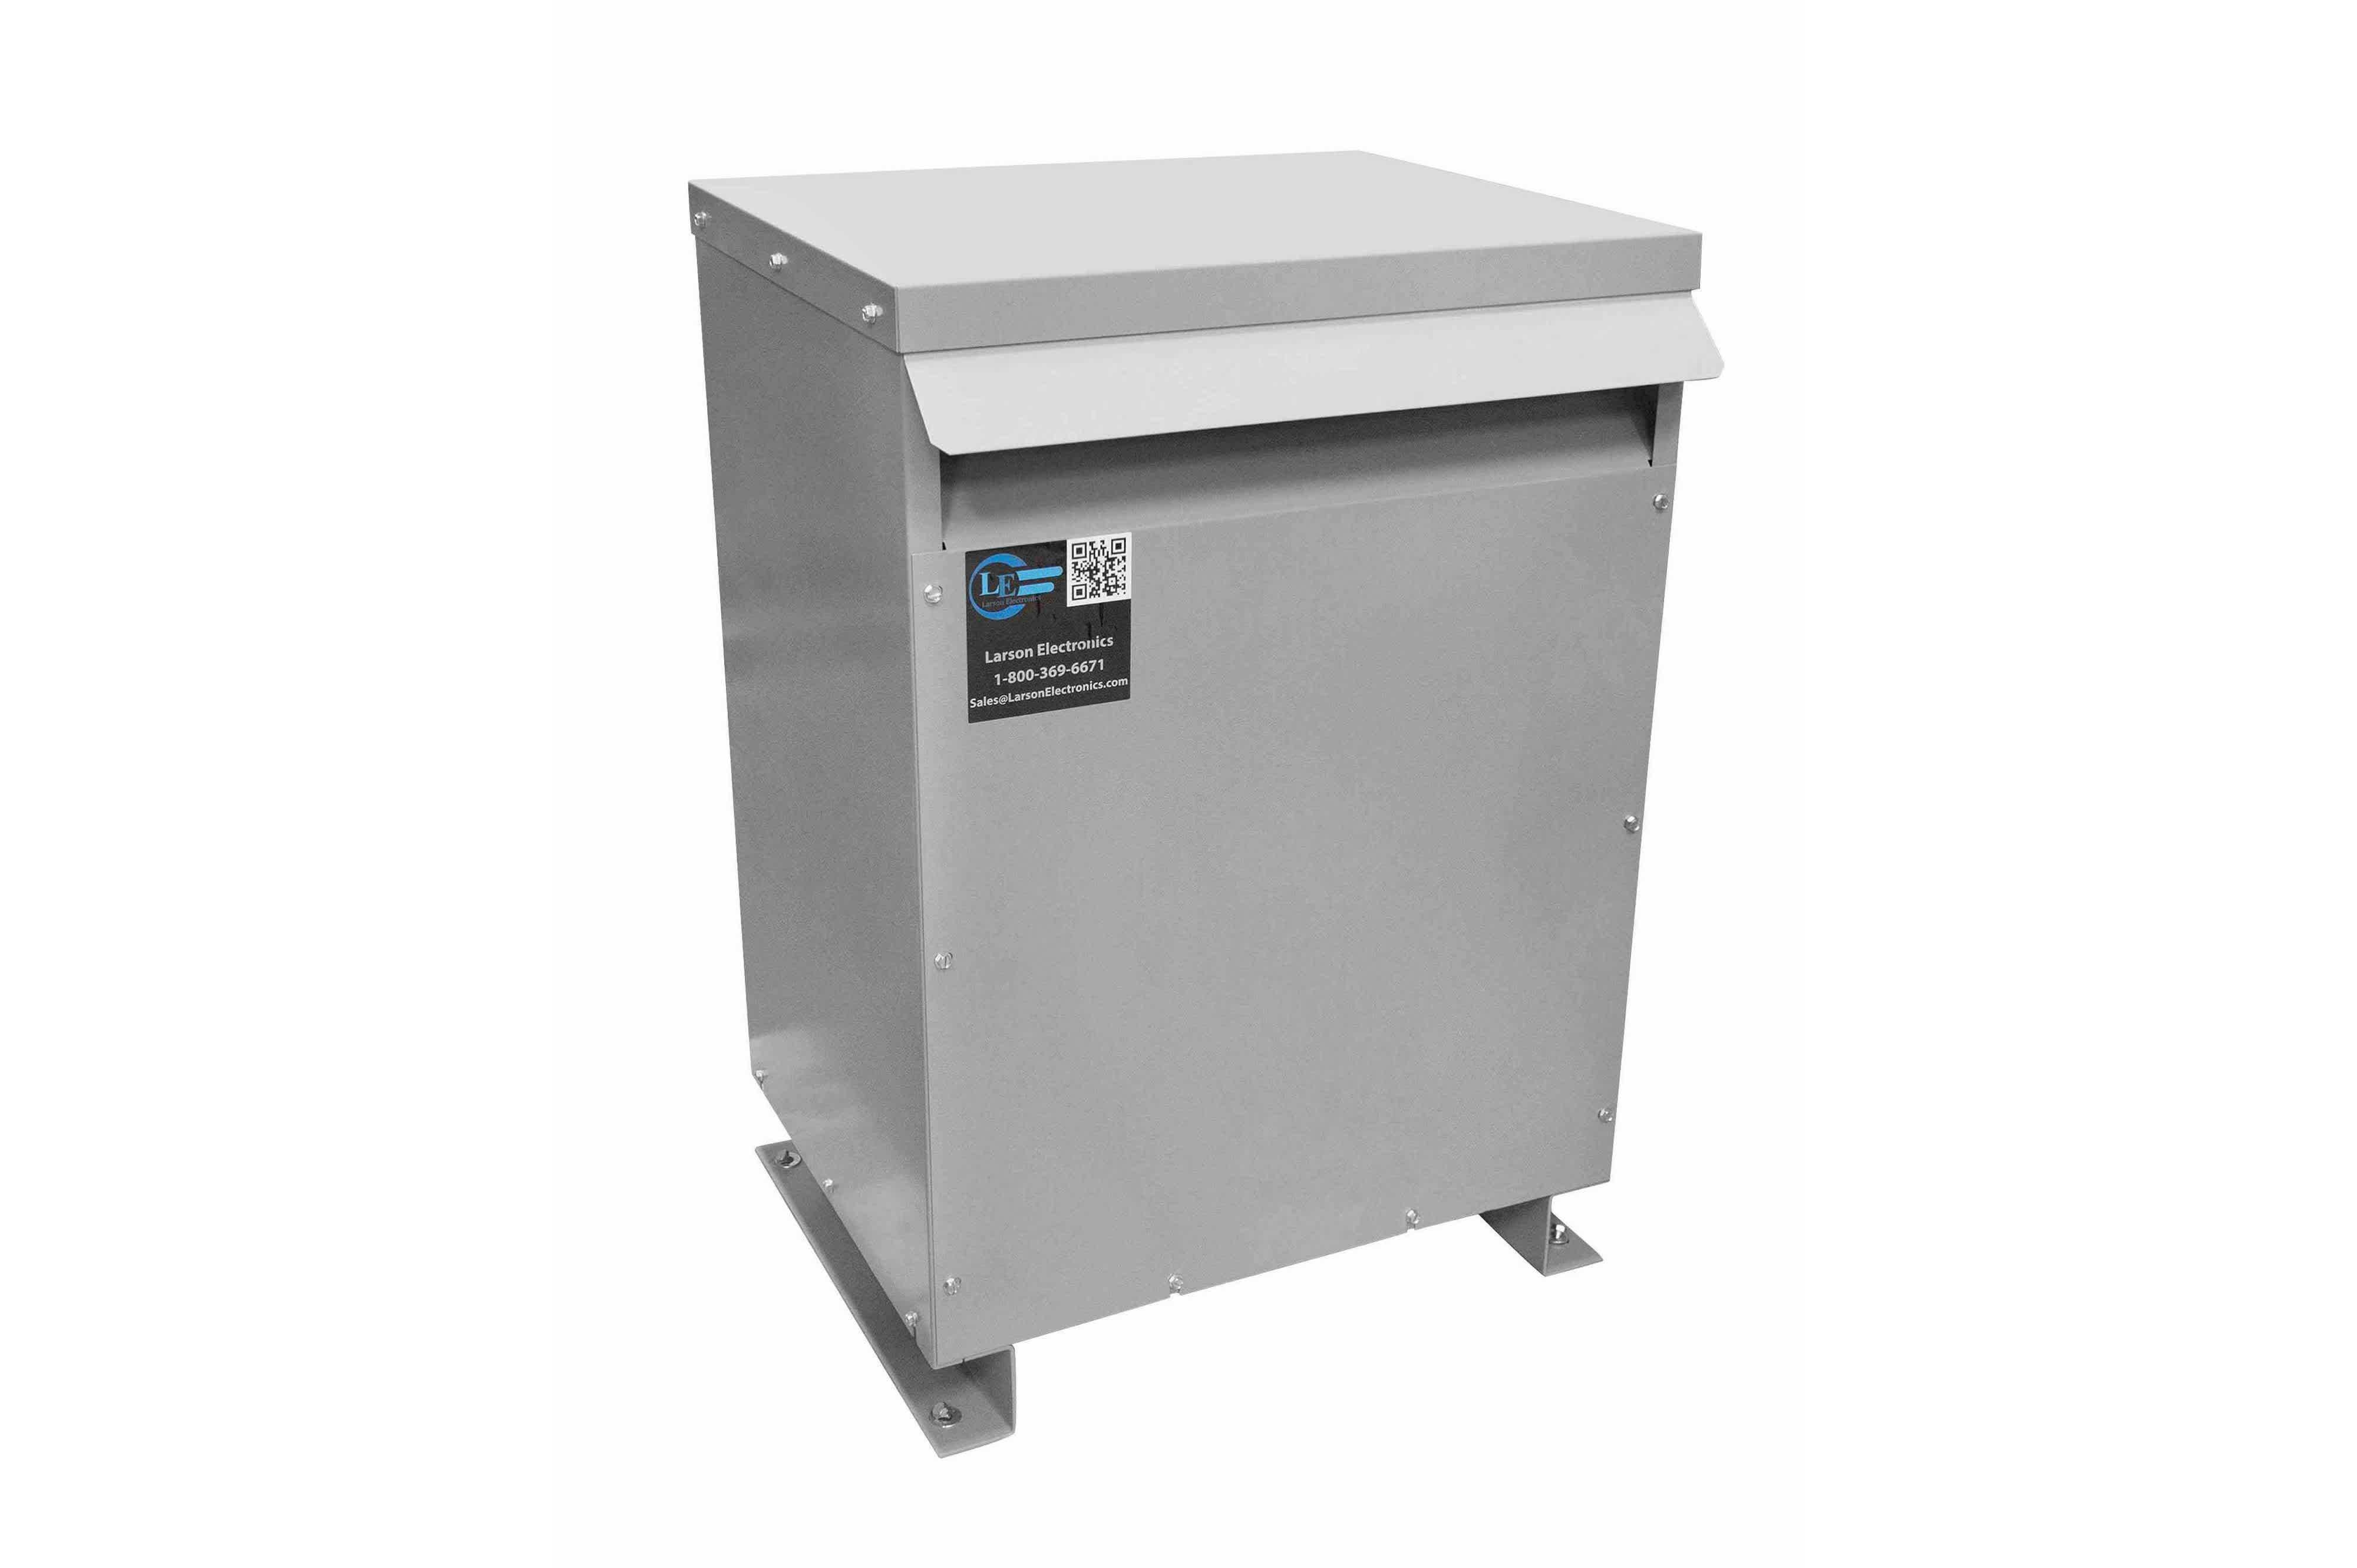 27 kVA 3PH Isolation Transformer, 480V Wye Primary, 480V Delta Secondary, N3R, Ventilated, 60 Hz